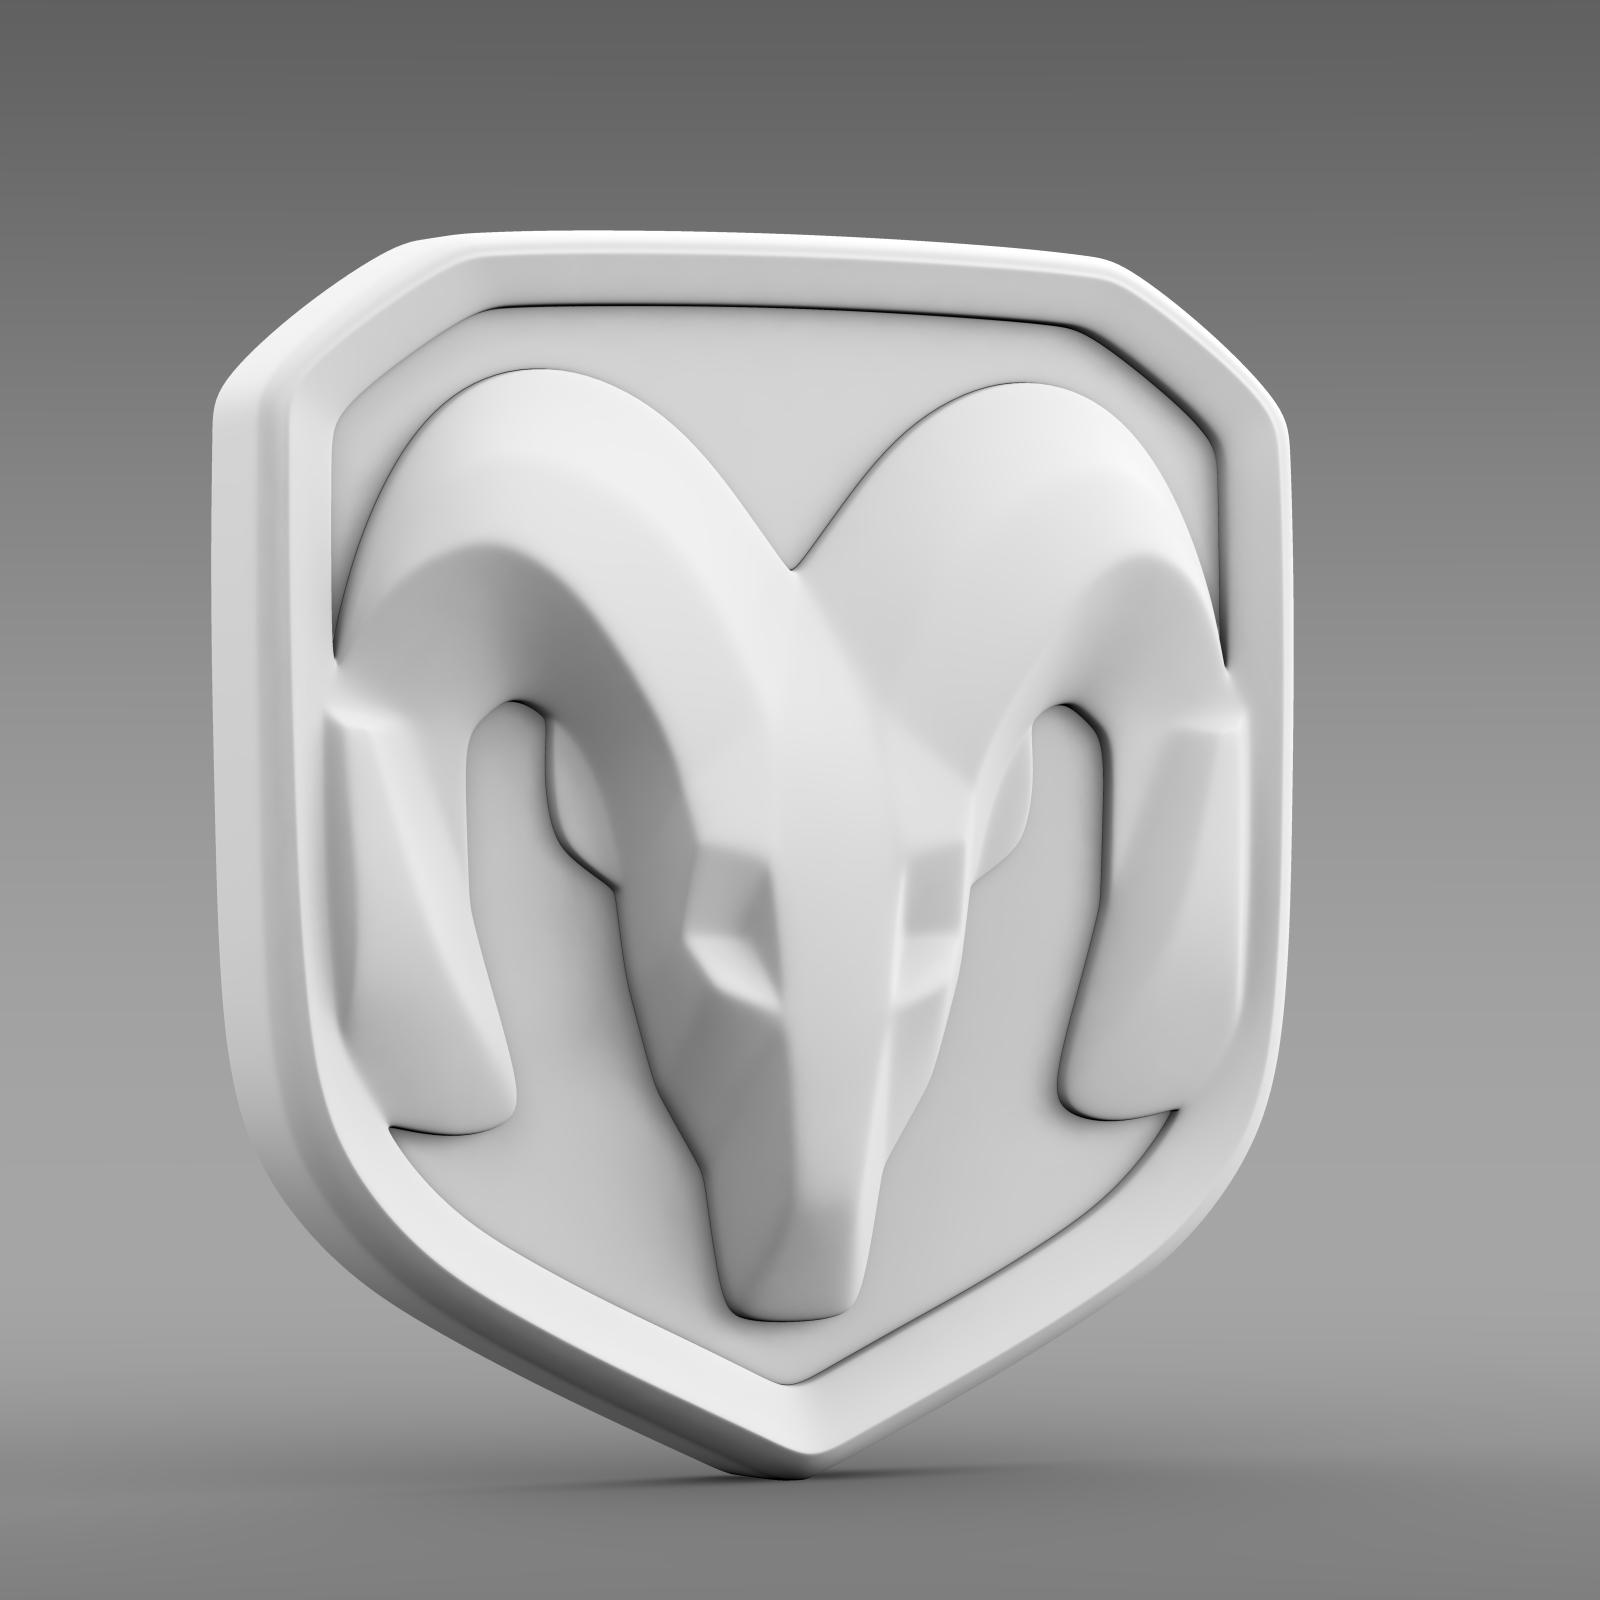 dodge ram logo 3d model 3ds max fbx c4d lwo ma mb hrc xsi obj 213228